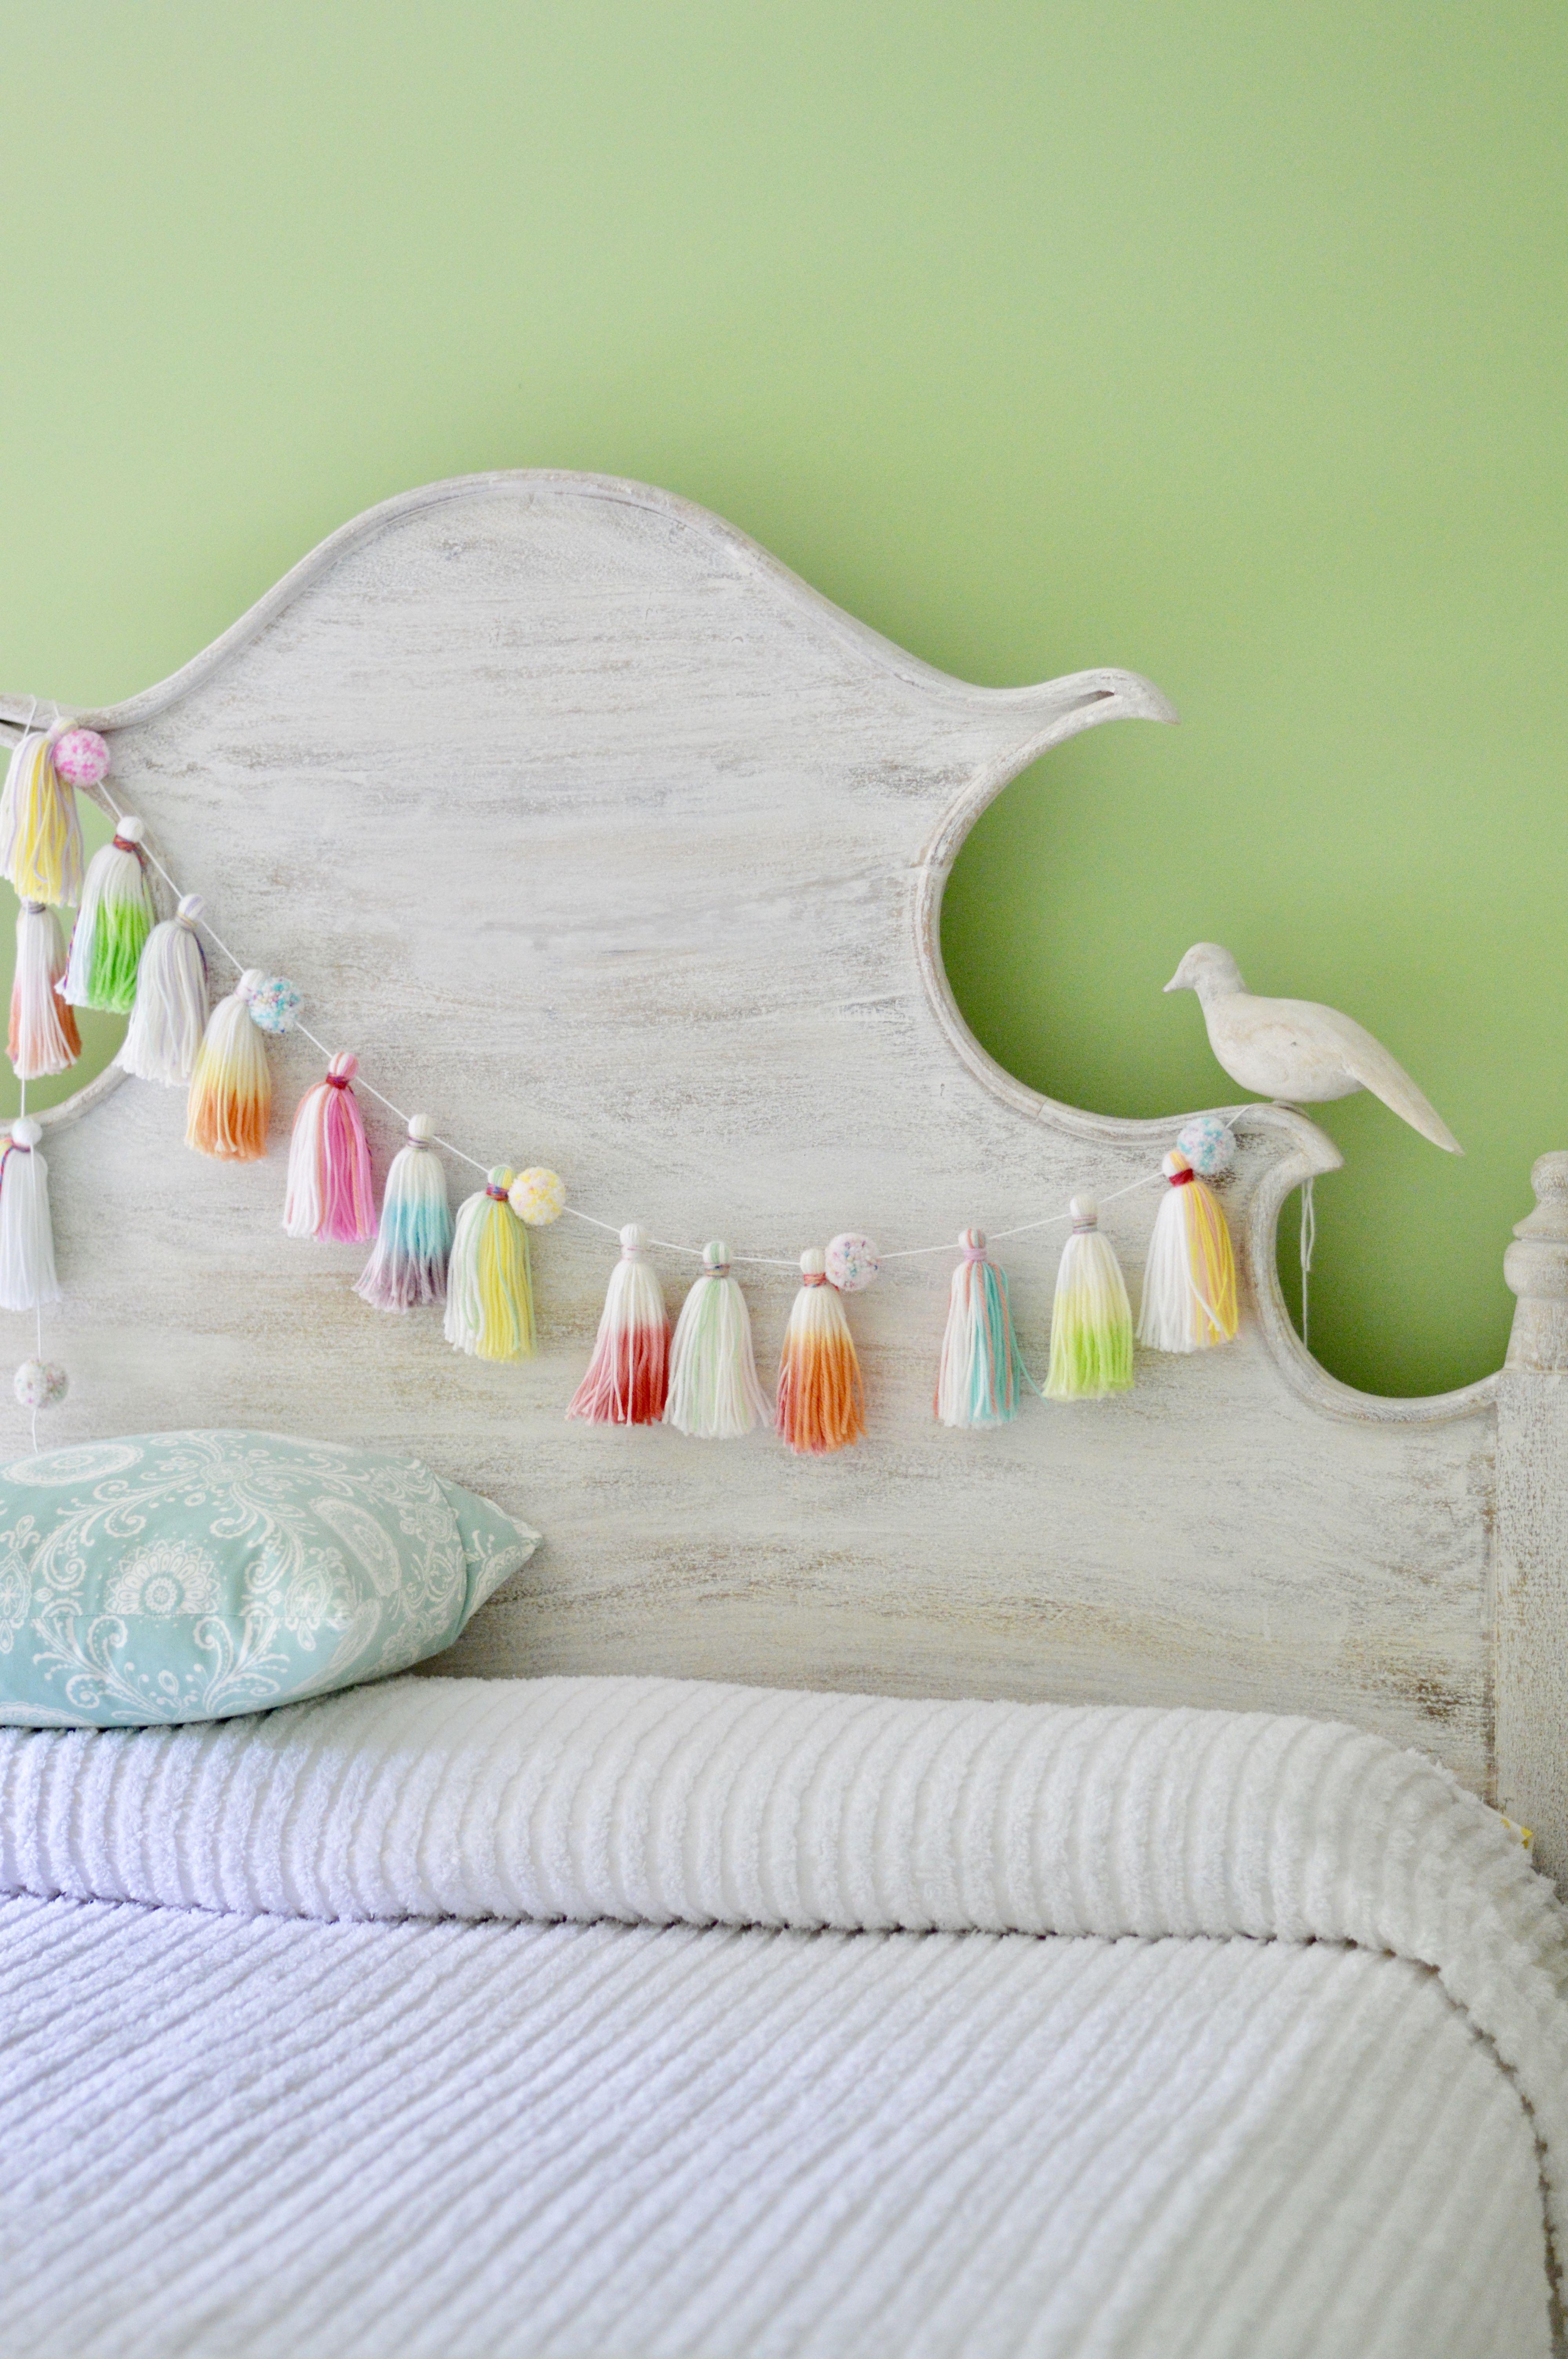 delightful Tassel Garland Nursery Part - 18: yarn tassel pompom garland - tassel garland - pompom garland - nursery  decor - rainbow tassels - baby shower decoration - nursery ideas - dip dye  tassels